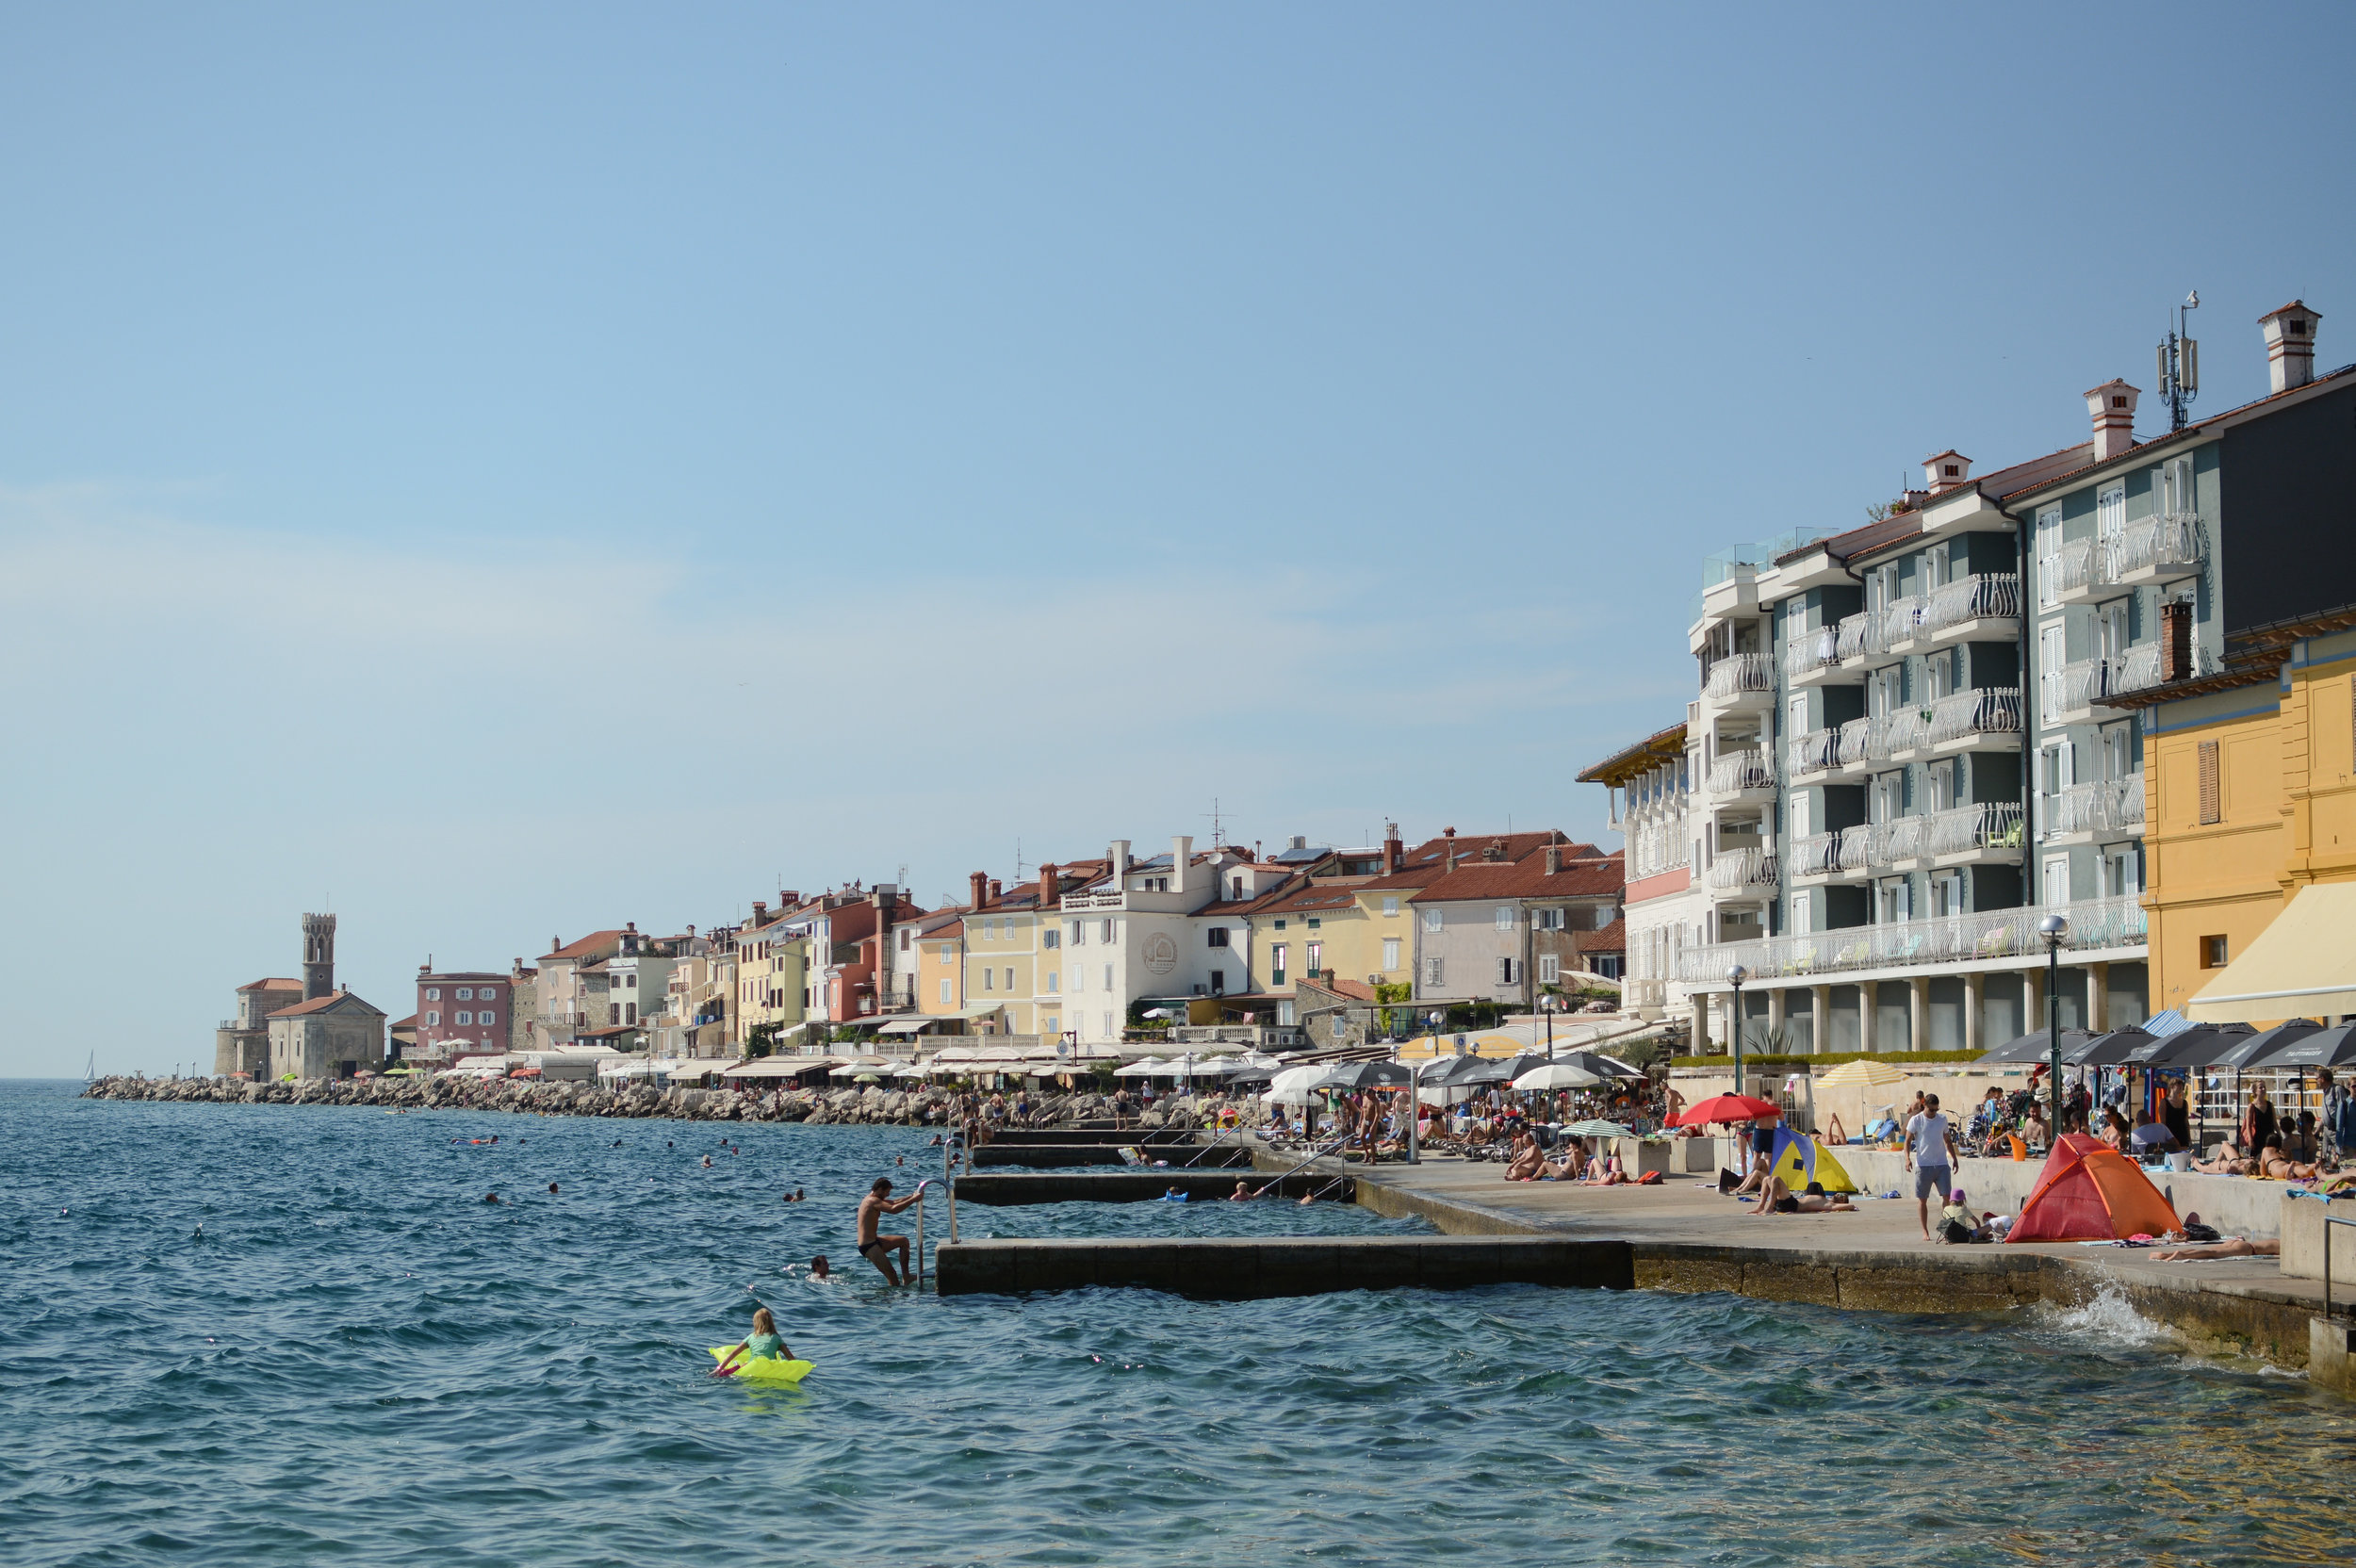 Piran, Slovenia  July 2016